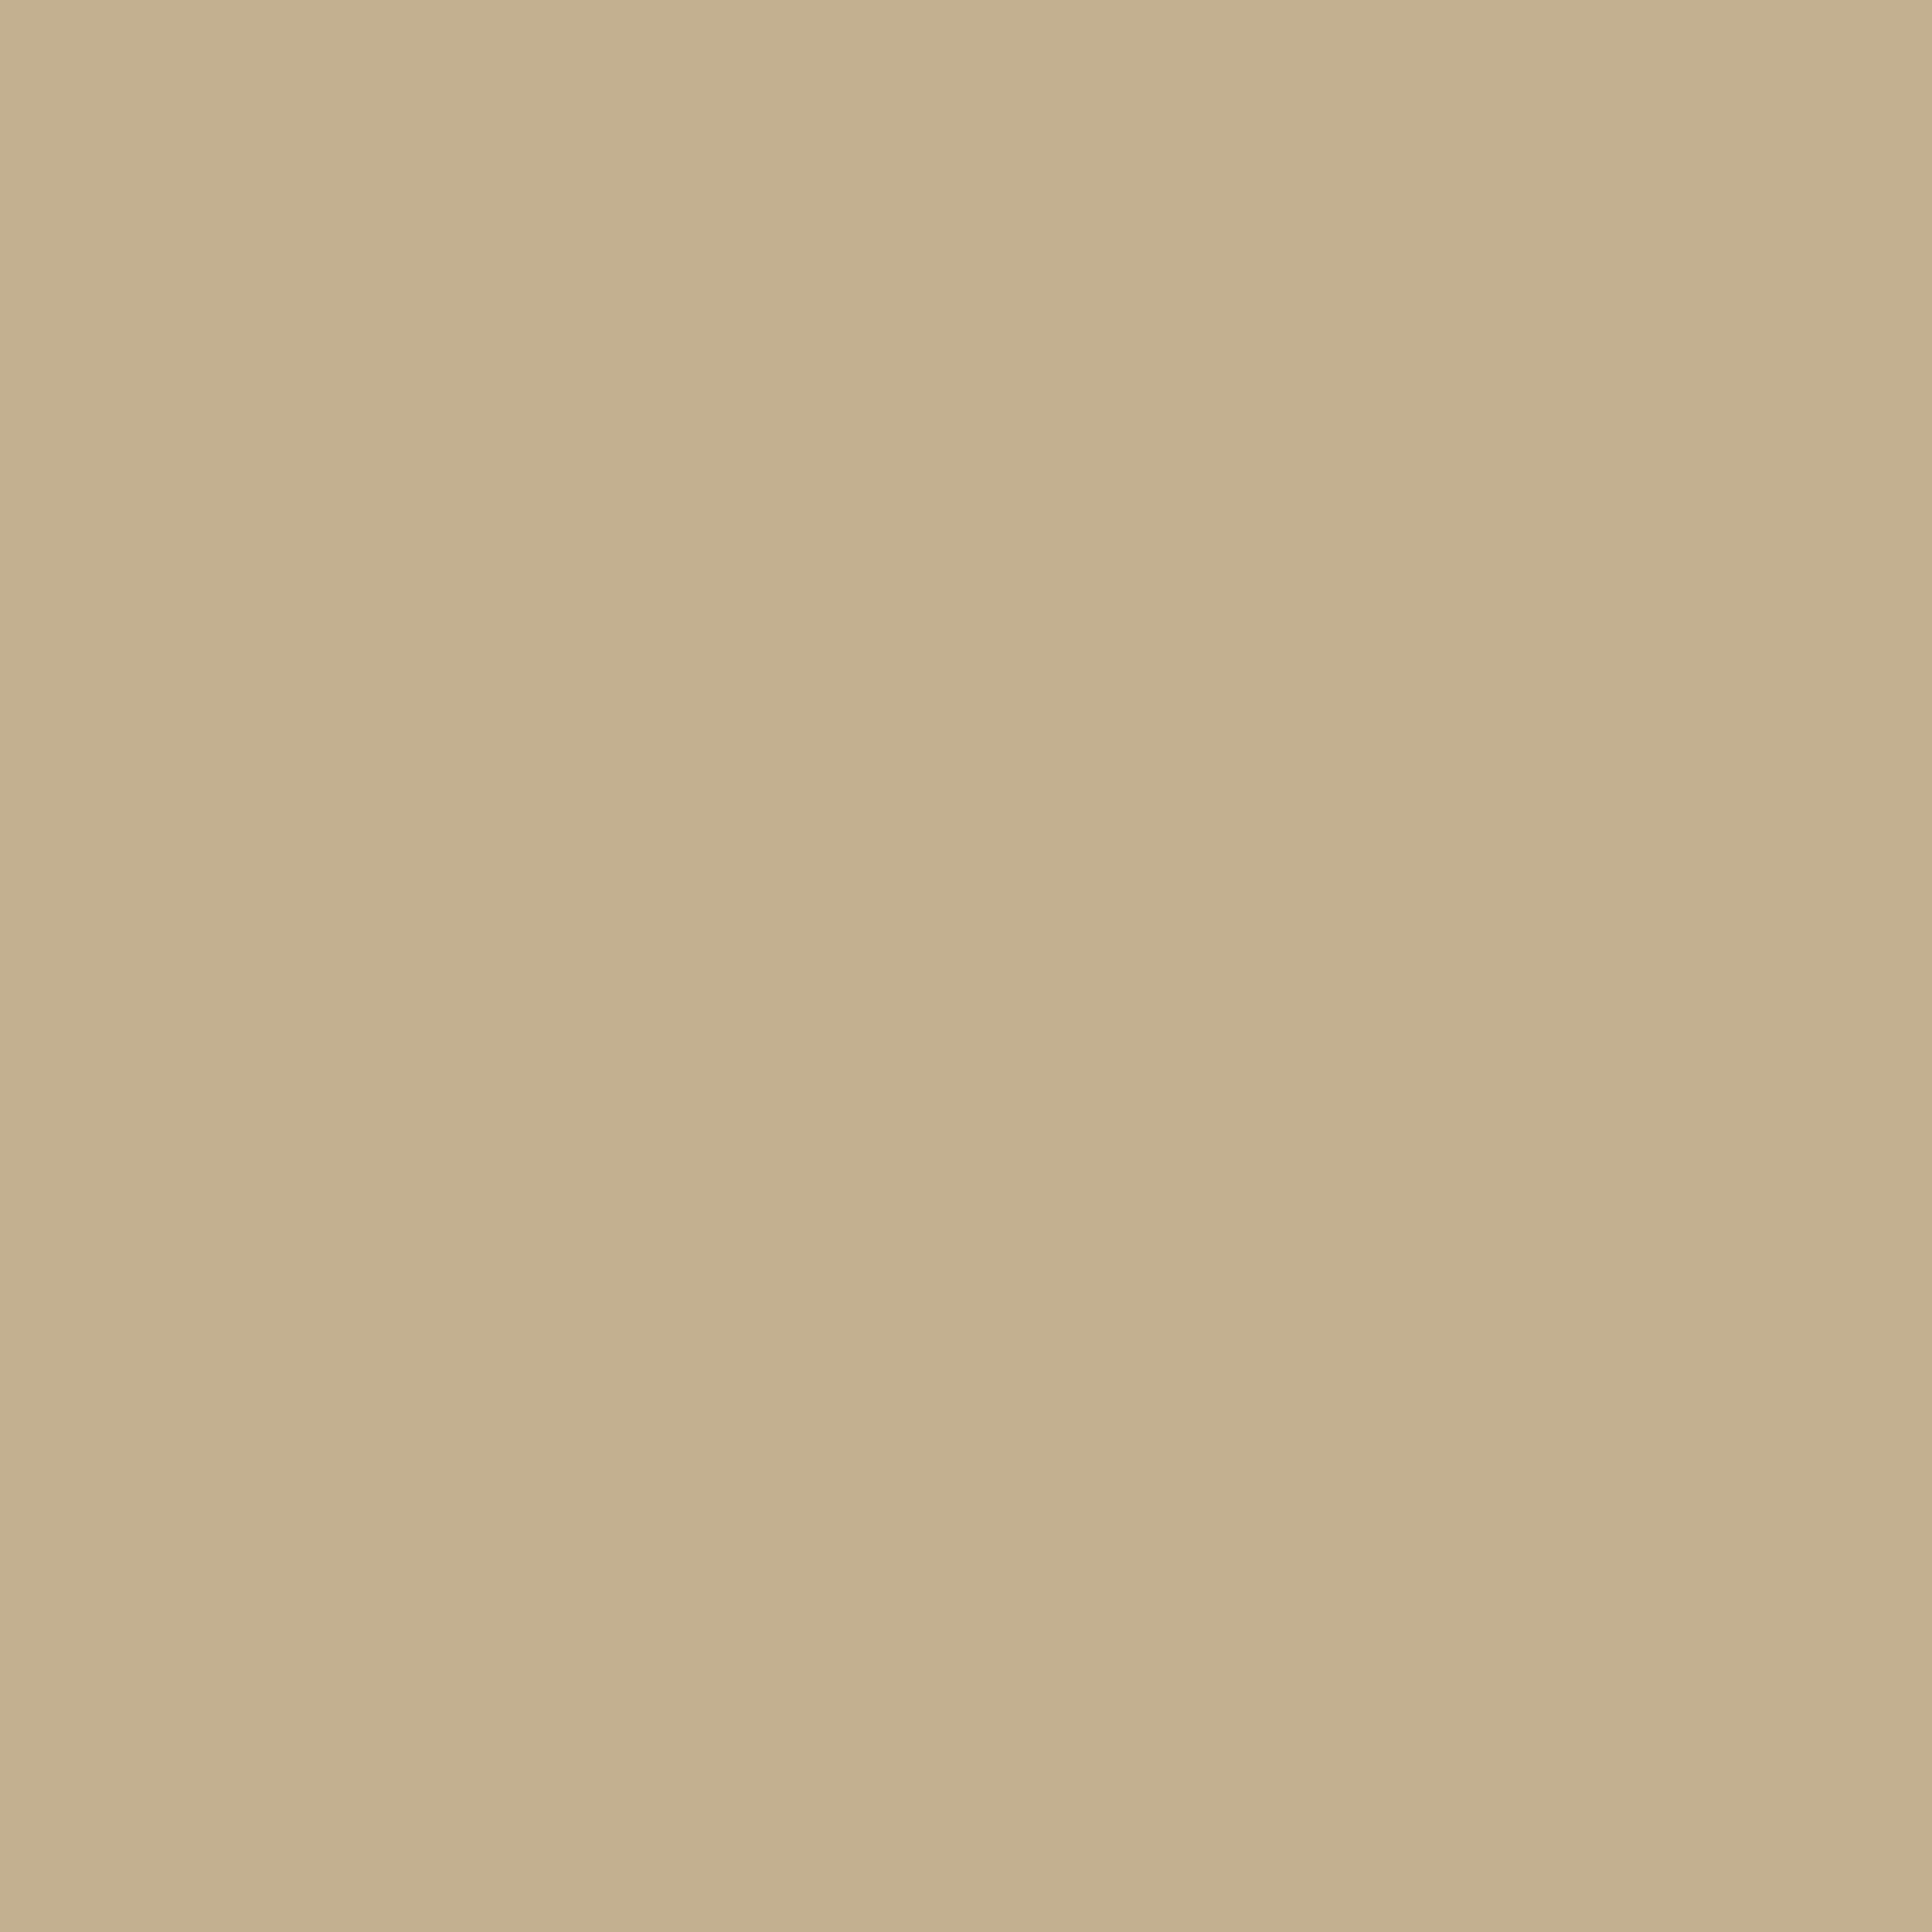 3600x3600 Khaki Web Solid Color Background